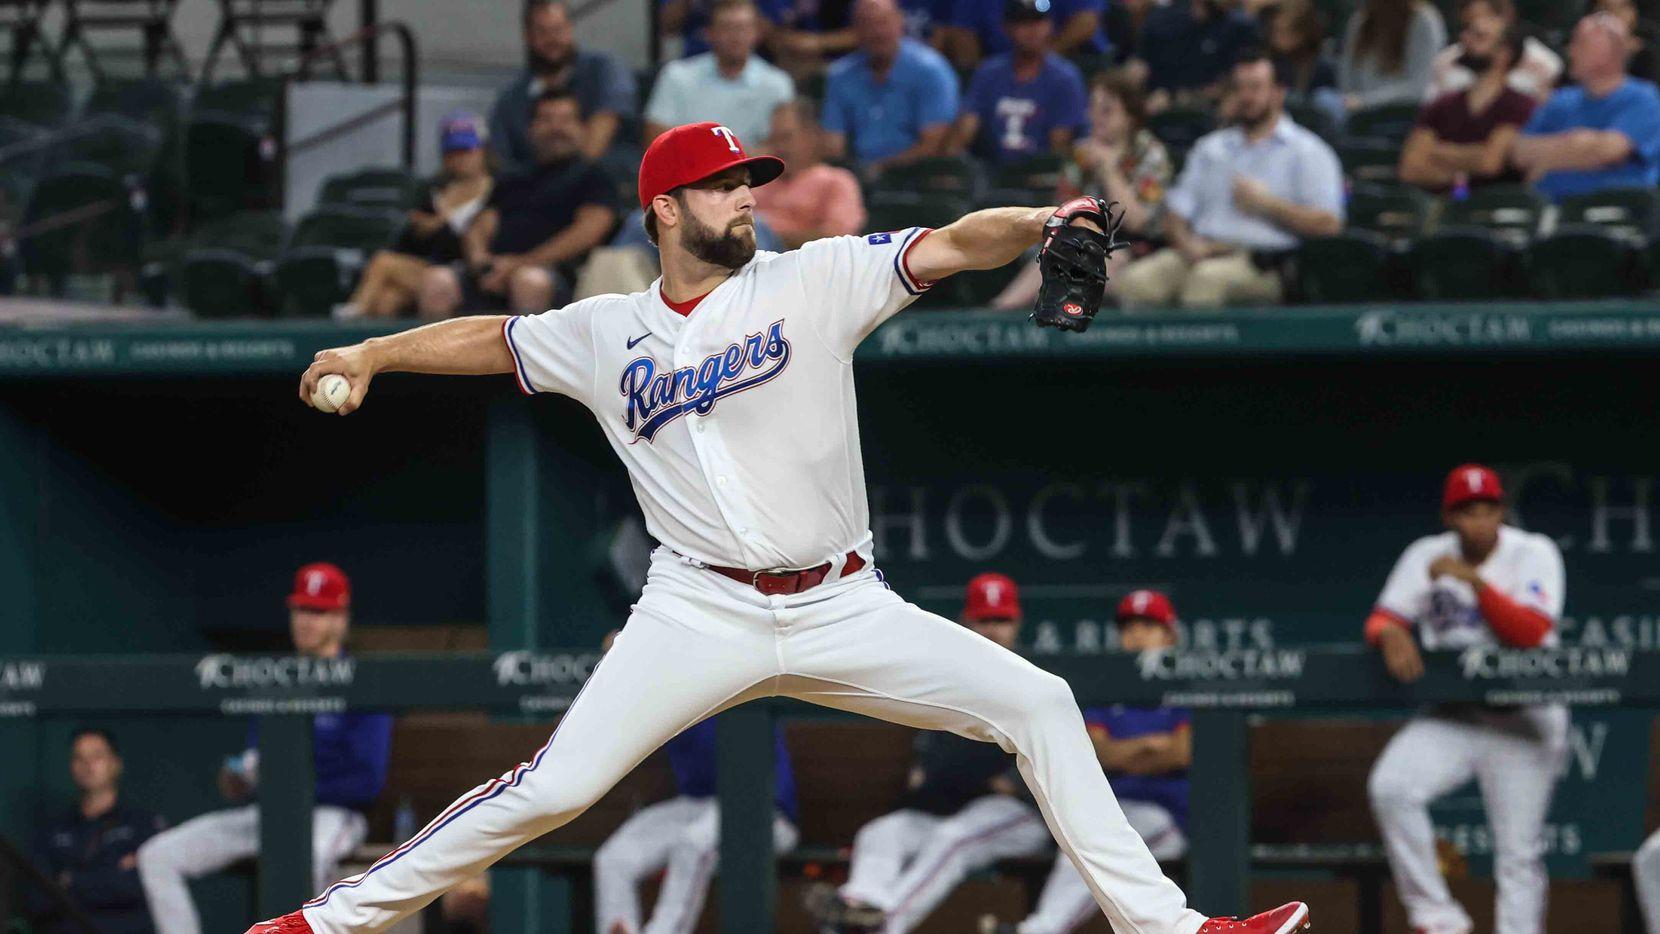 Jordan Lyles (24) pitches during Arizona Diamondbacks at Texas Rangers game at the Globe Life Field in Arlington, Texas on Wednesday, July 28, 2021.